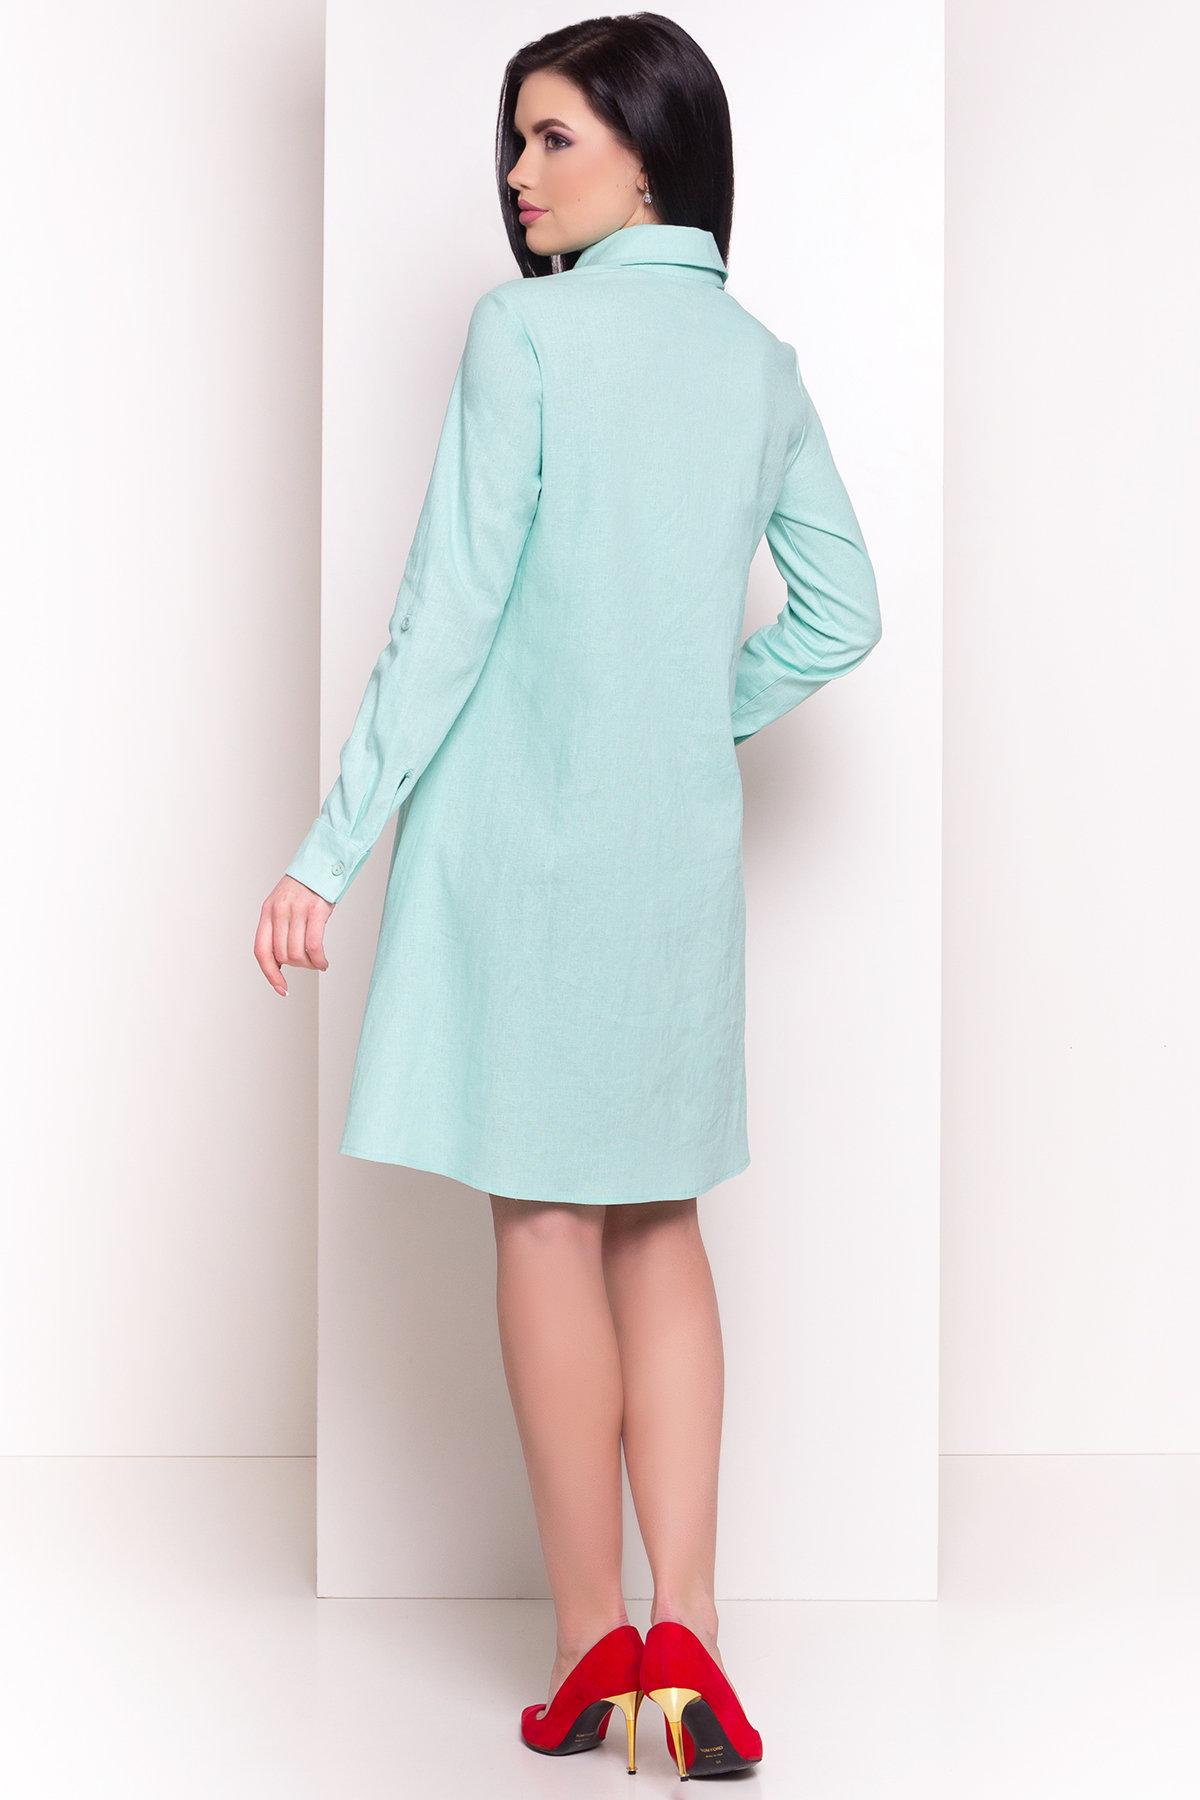 Платье Бри 2706 АРТ. 34088 Цвет: Мята - фото 4, интернет магазин tm-modus.ru